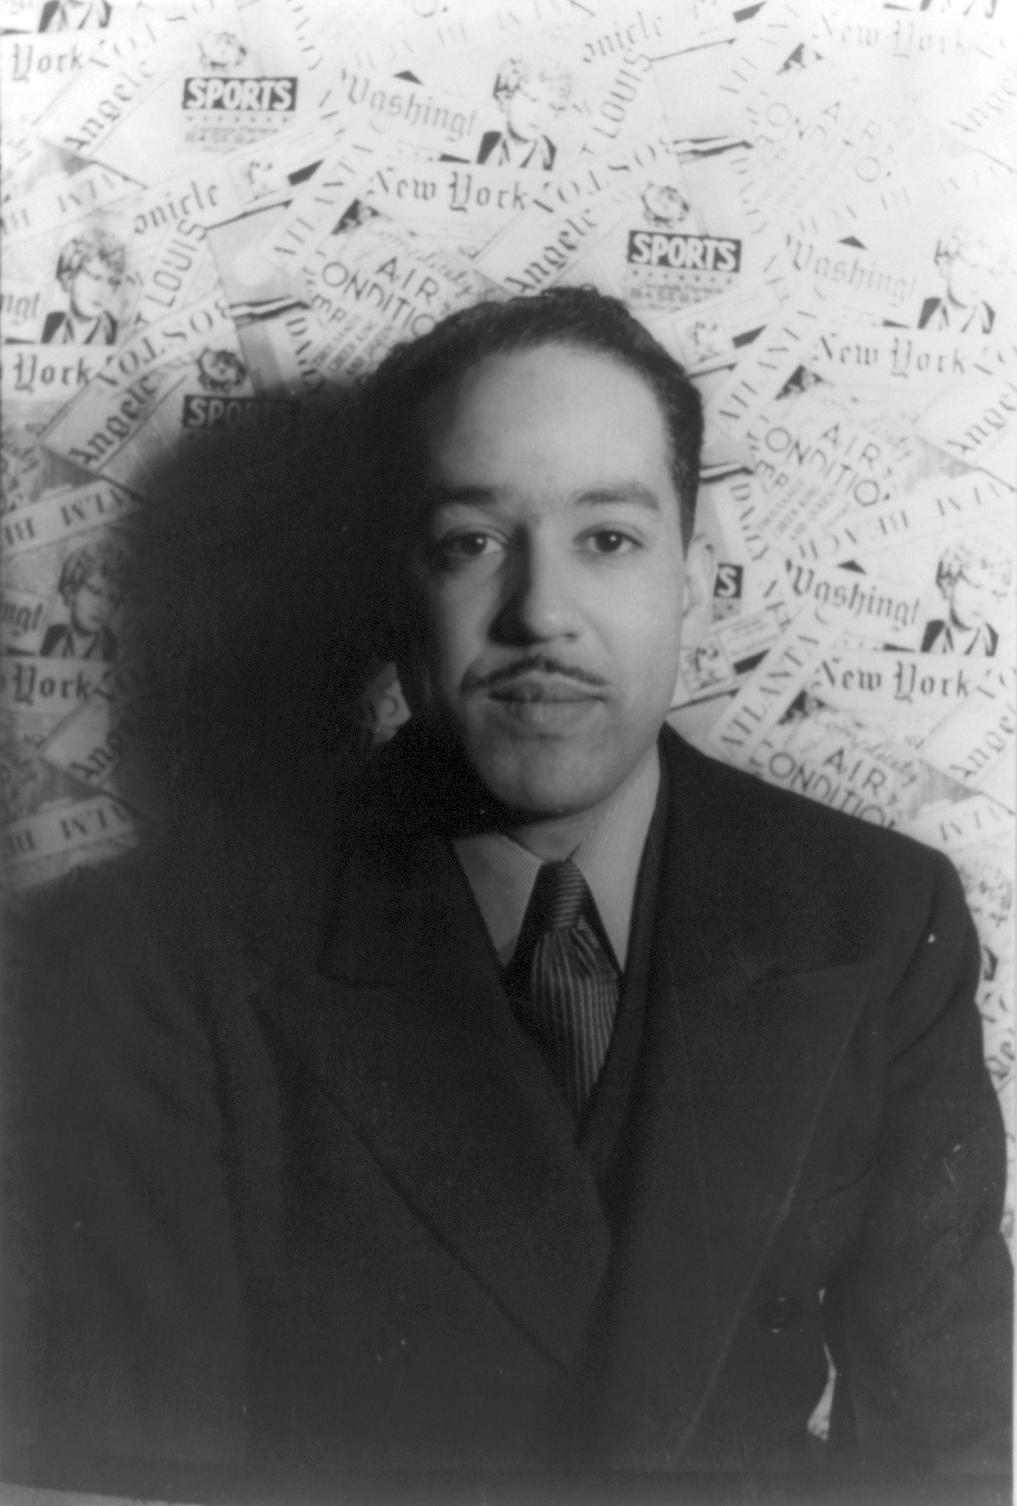 Langston Hughes photographed by Carl Van Vechten (Source: Wikimedia)